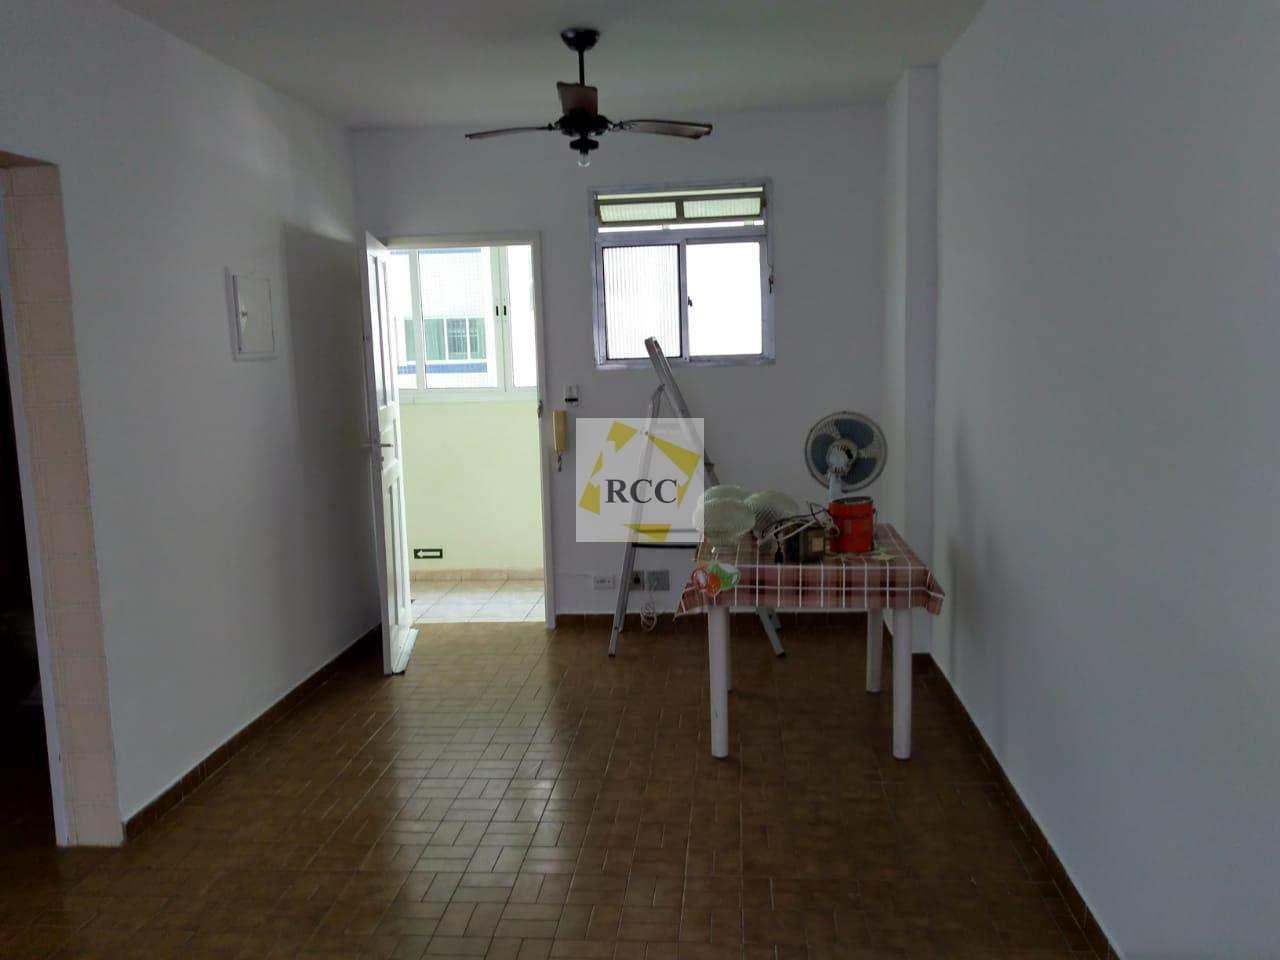 Kitnet com 1 dorm, Guilhermina, Praia Grande, Cod: RCR05